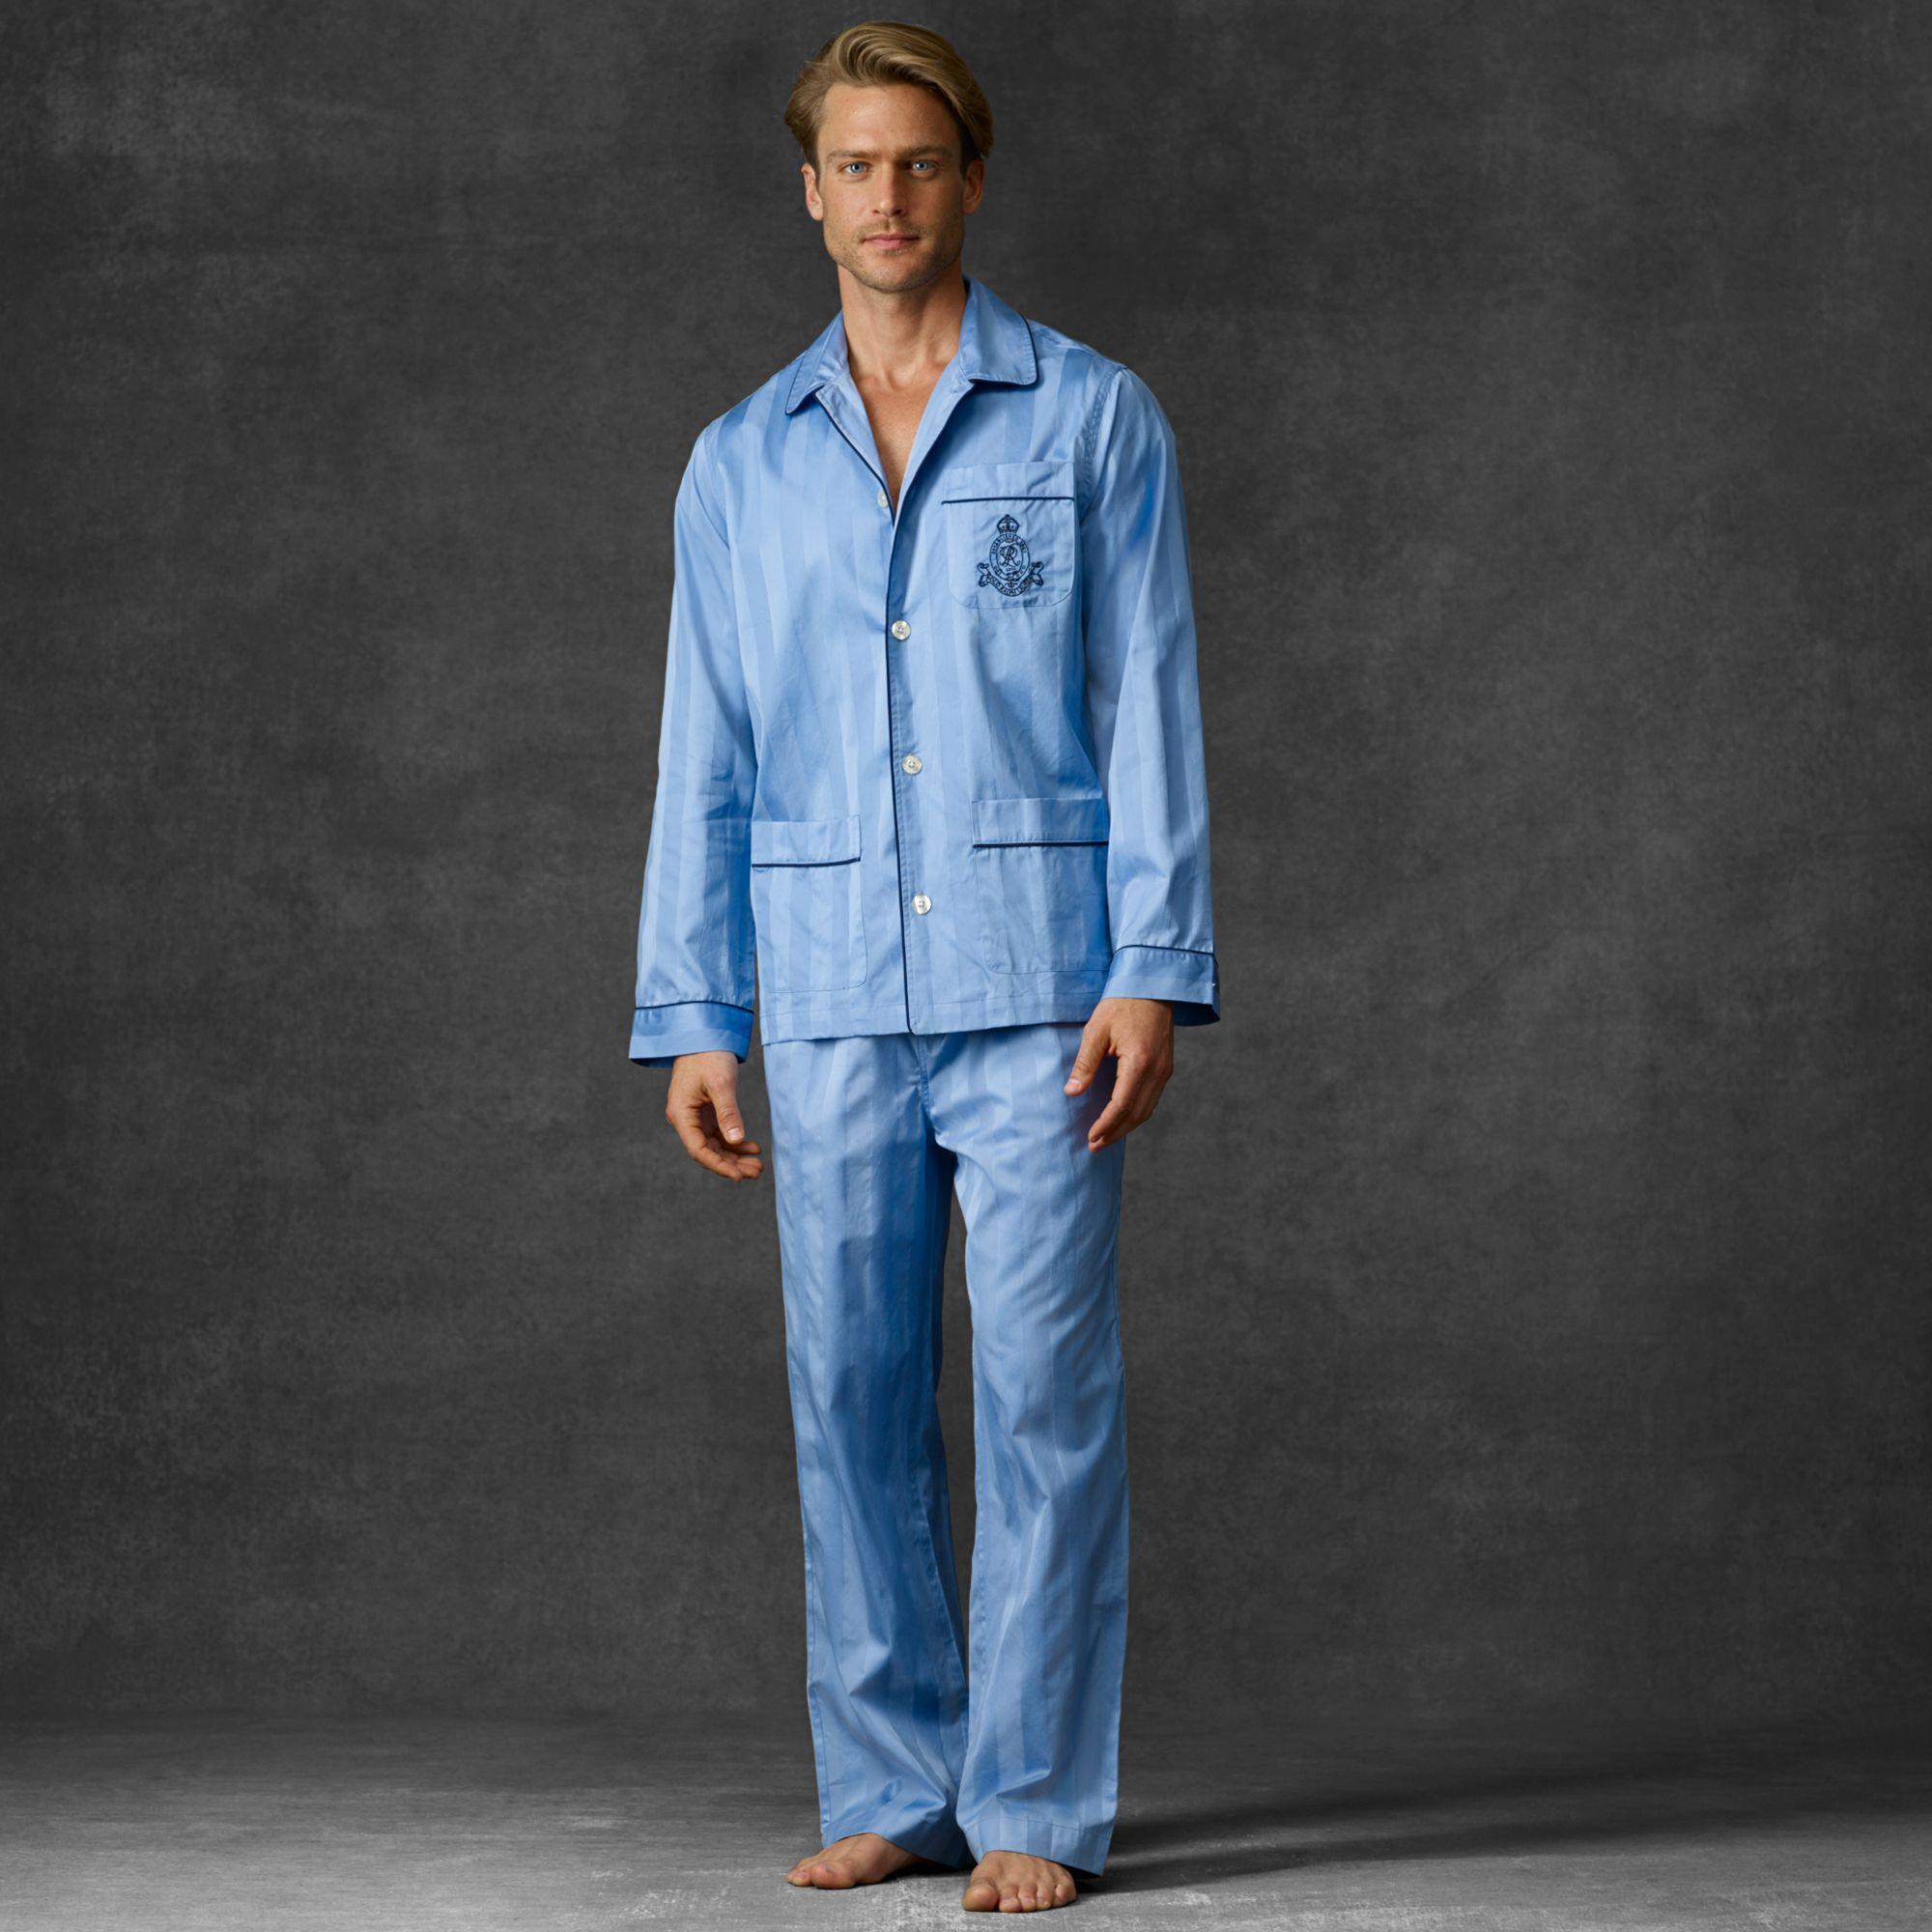 3ccc2d7394a9 Polo Ralph Lauren Cotton Pajama Set in Blue for Men - Lyst